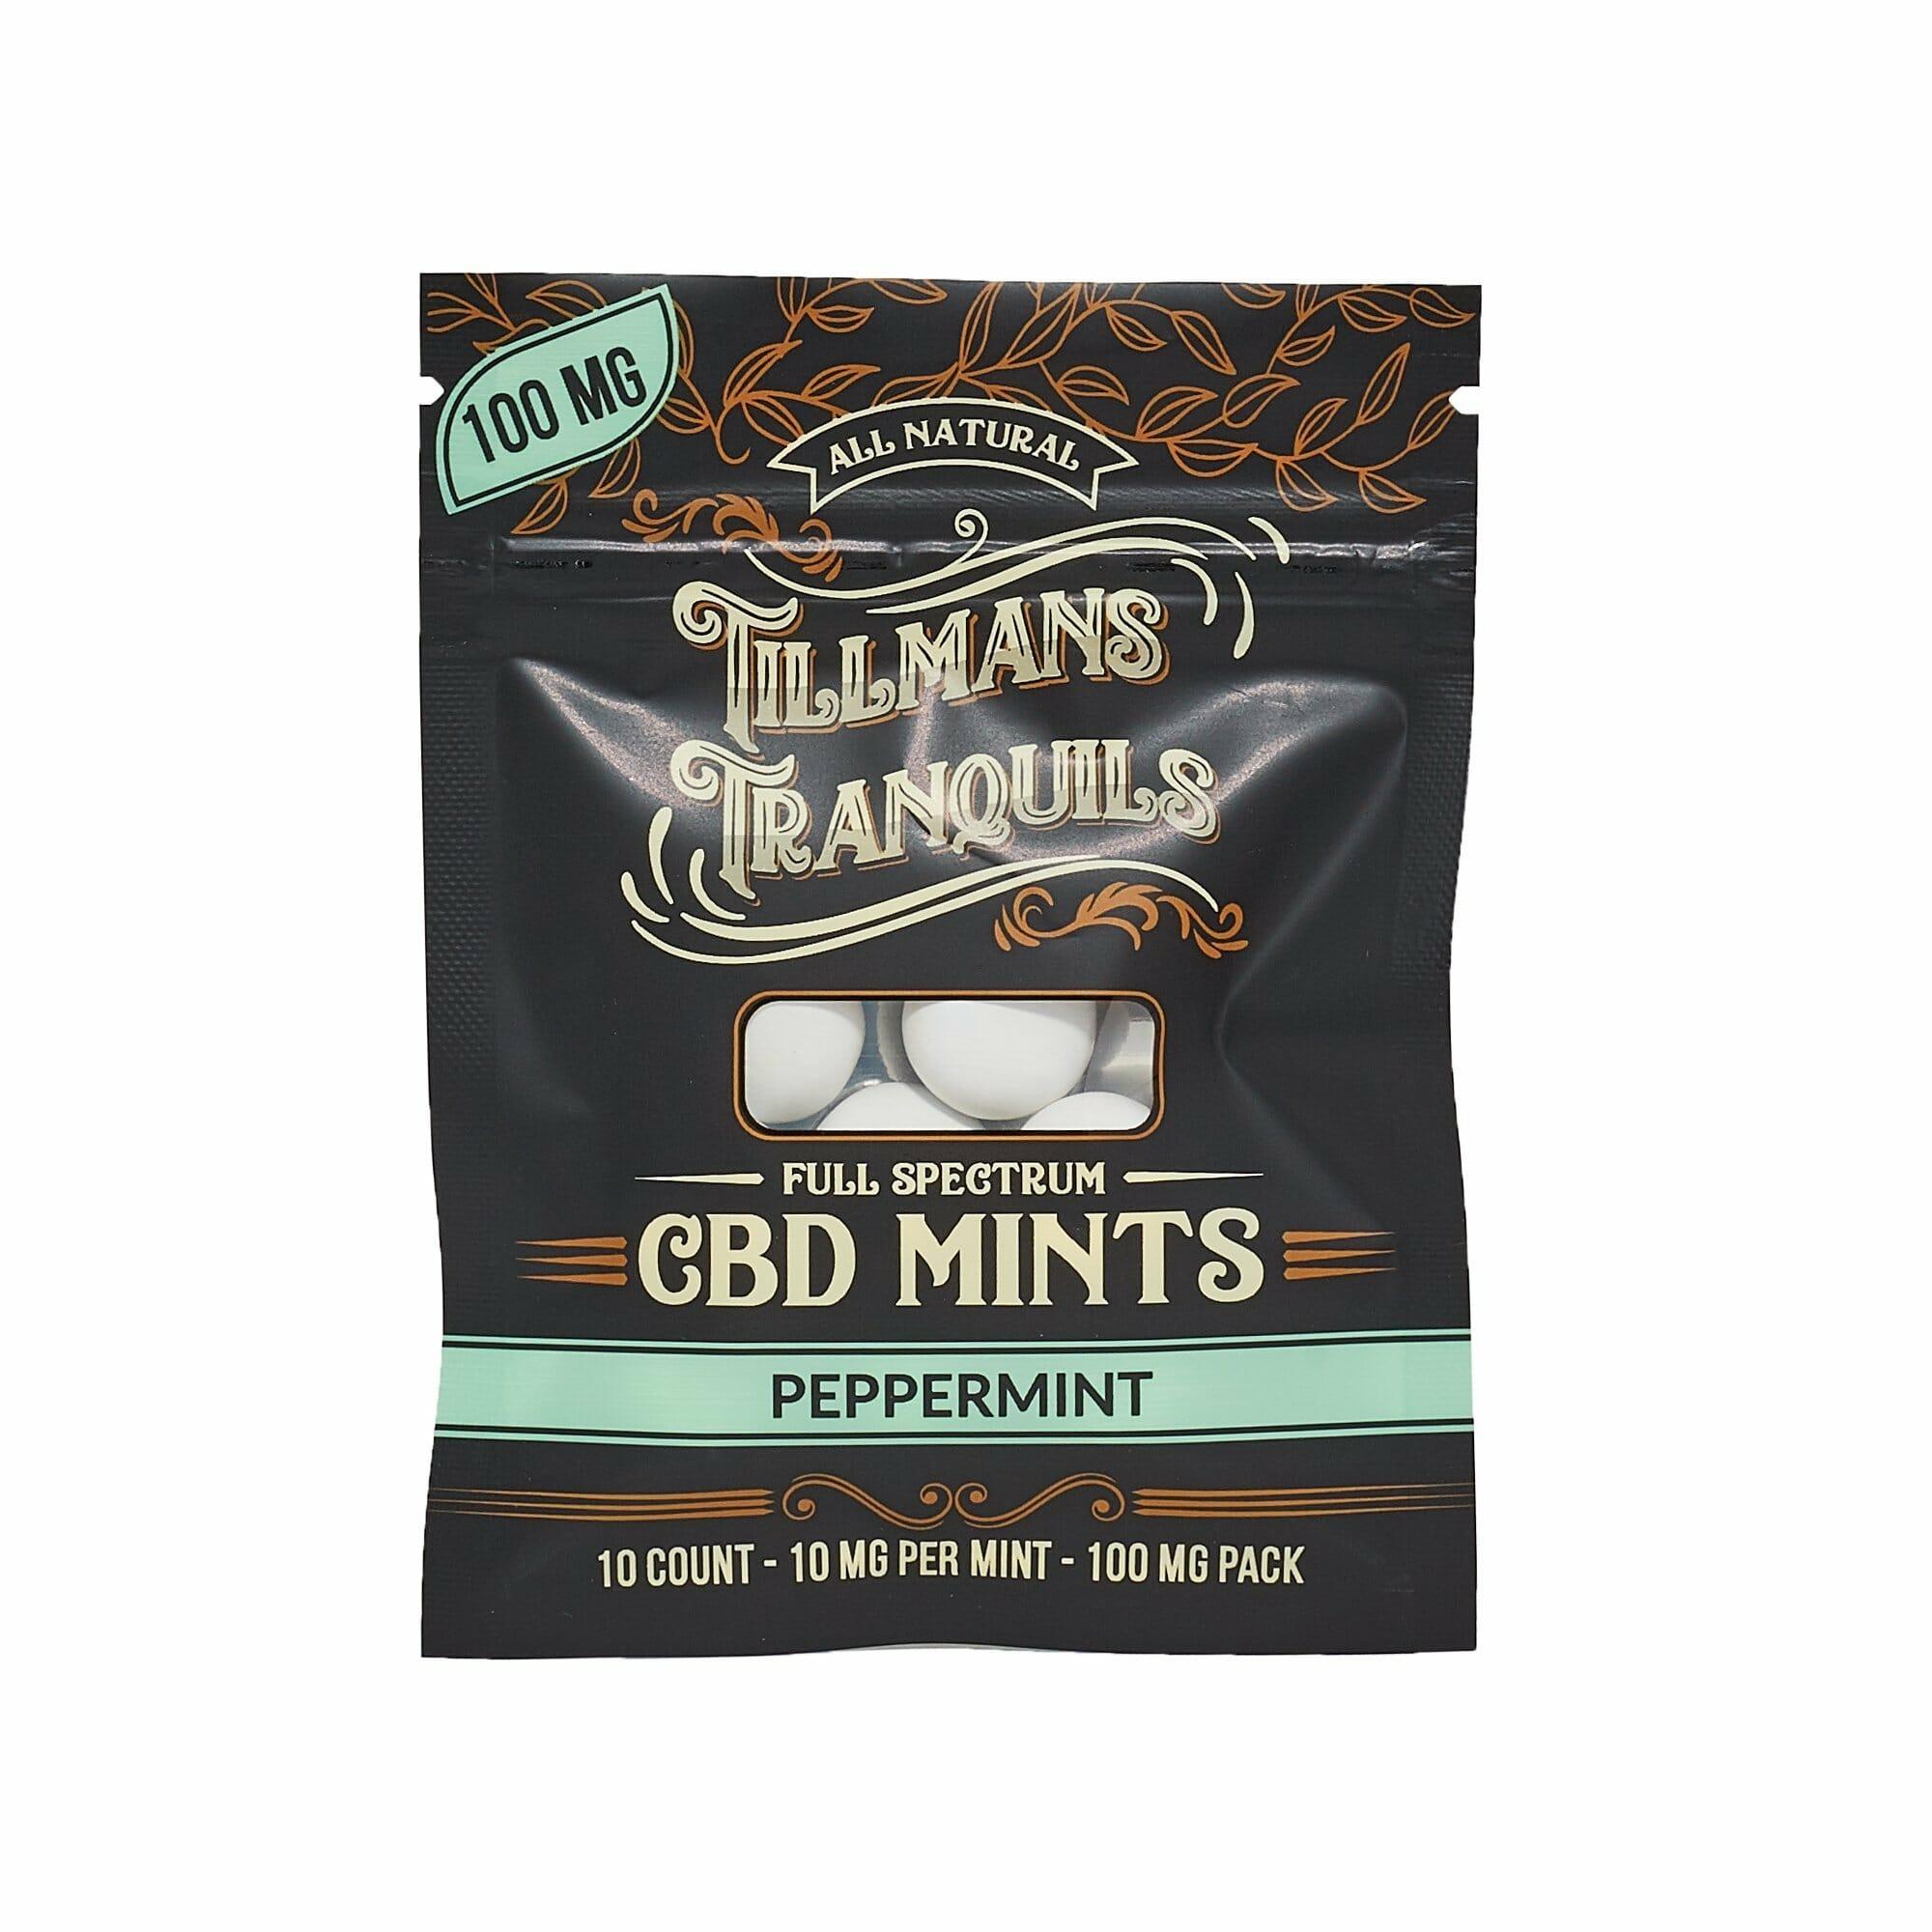 Peppermint Full Spectrum CBD Mints